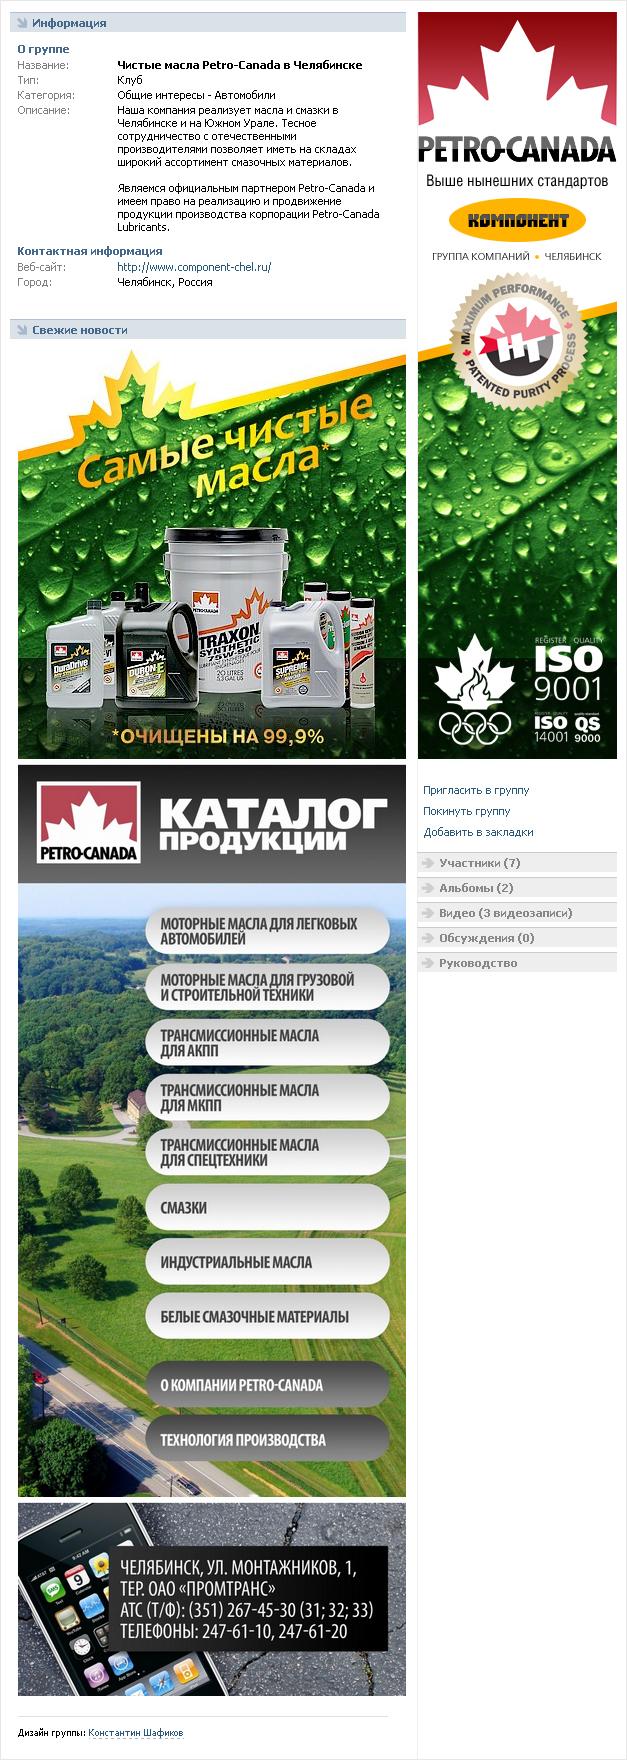 VK — Petro Canada, Челябинск